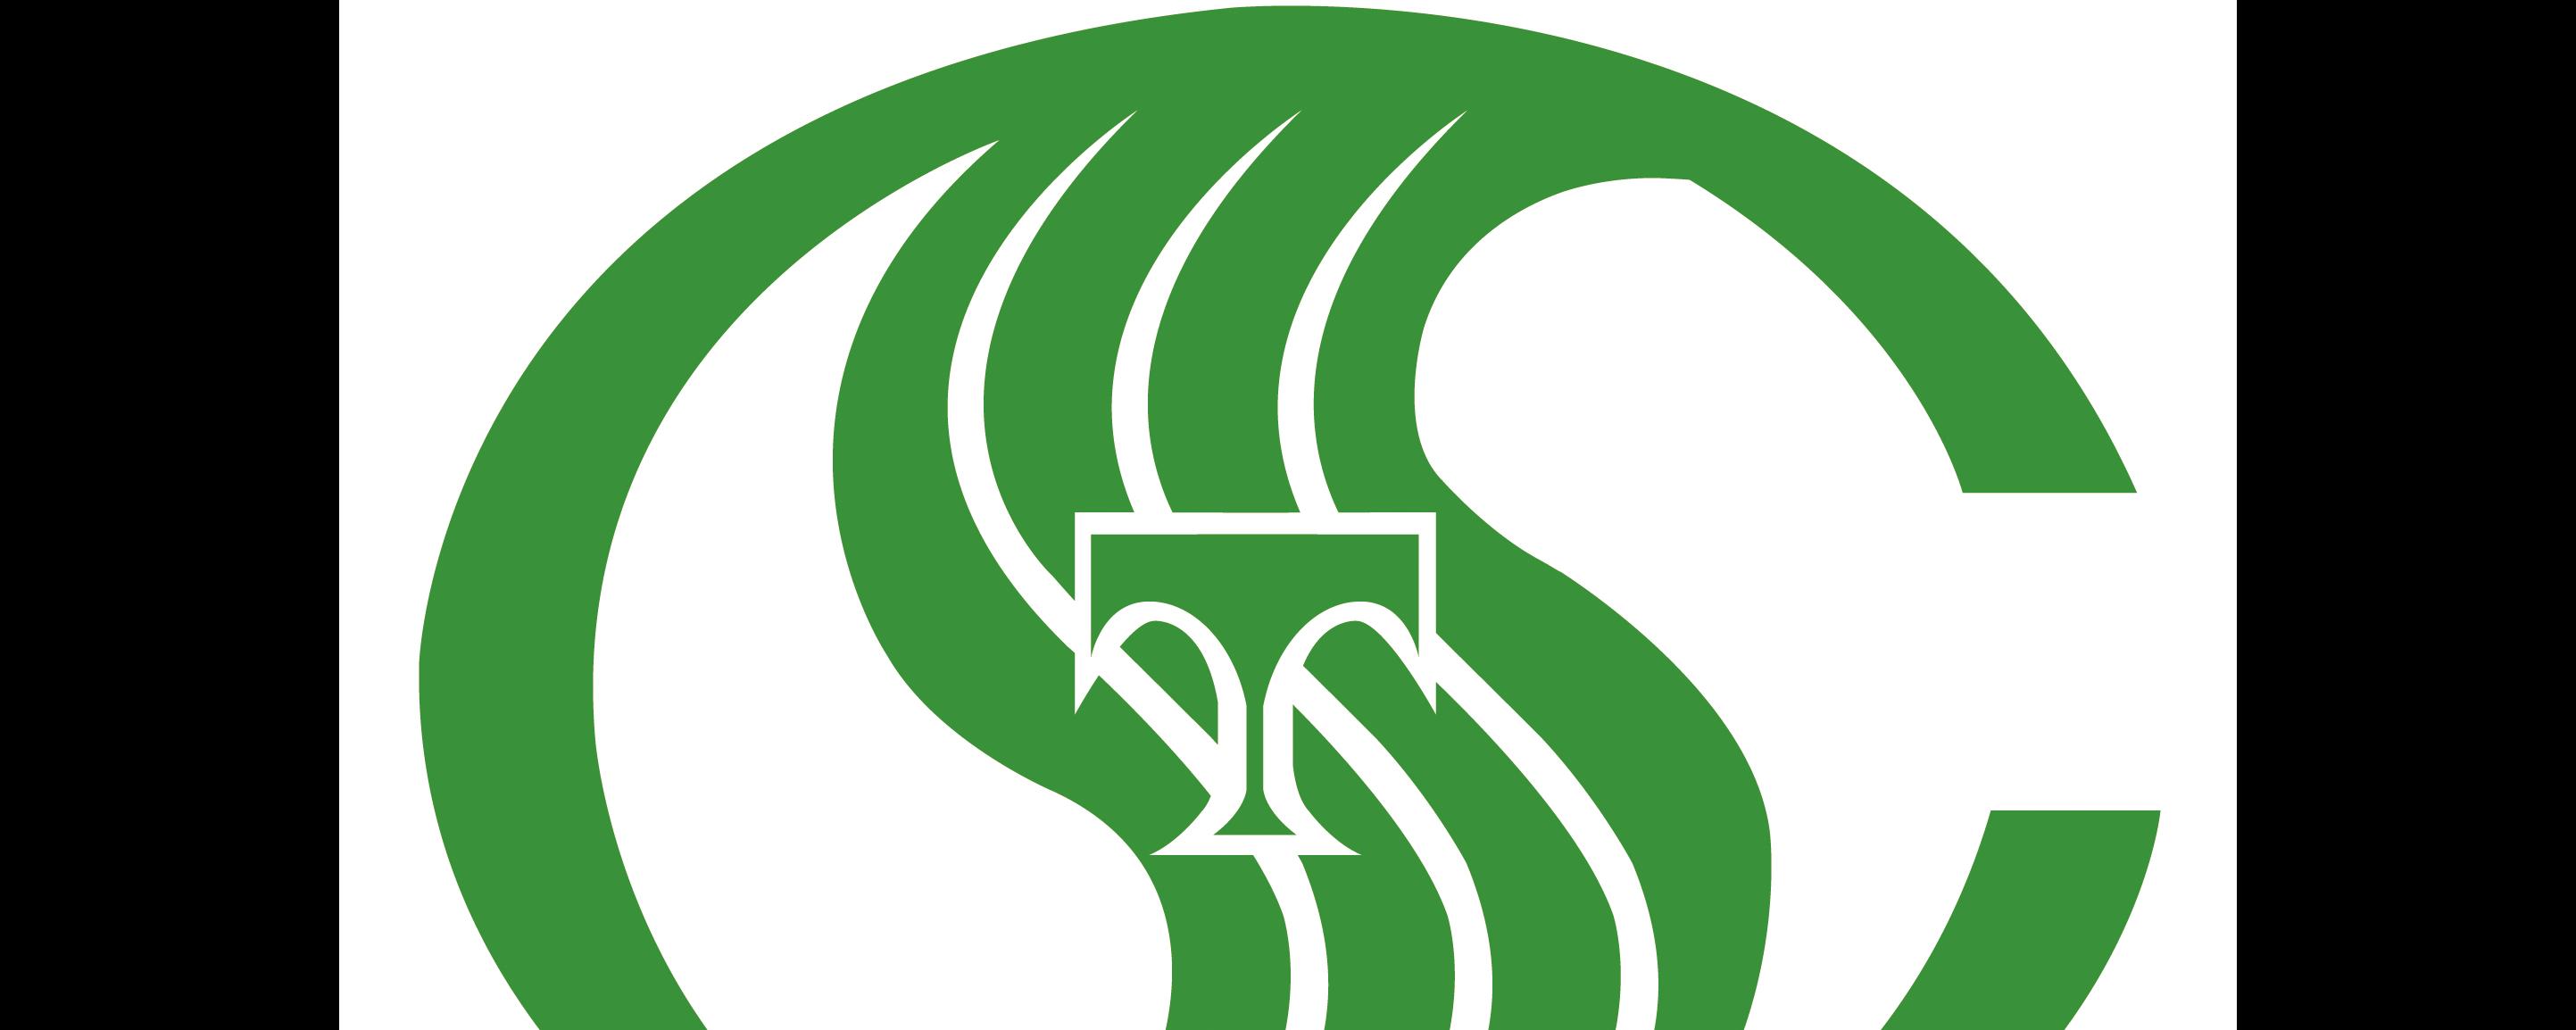 logo logo 标志 设计 图标 2886_1154